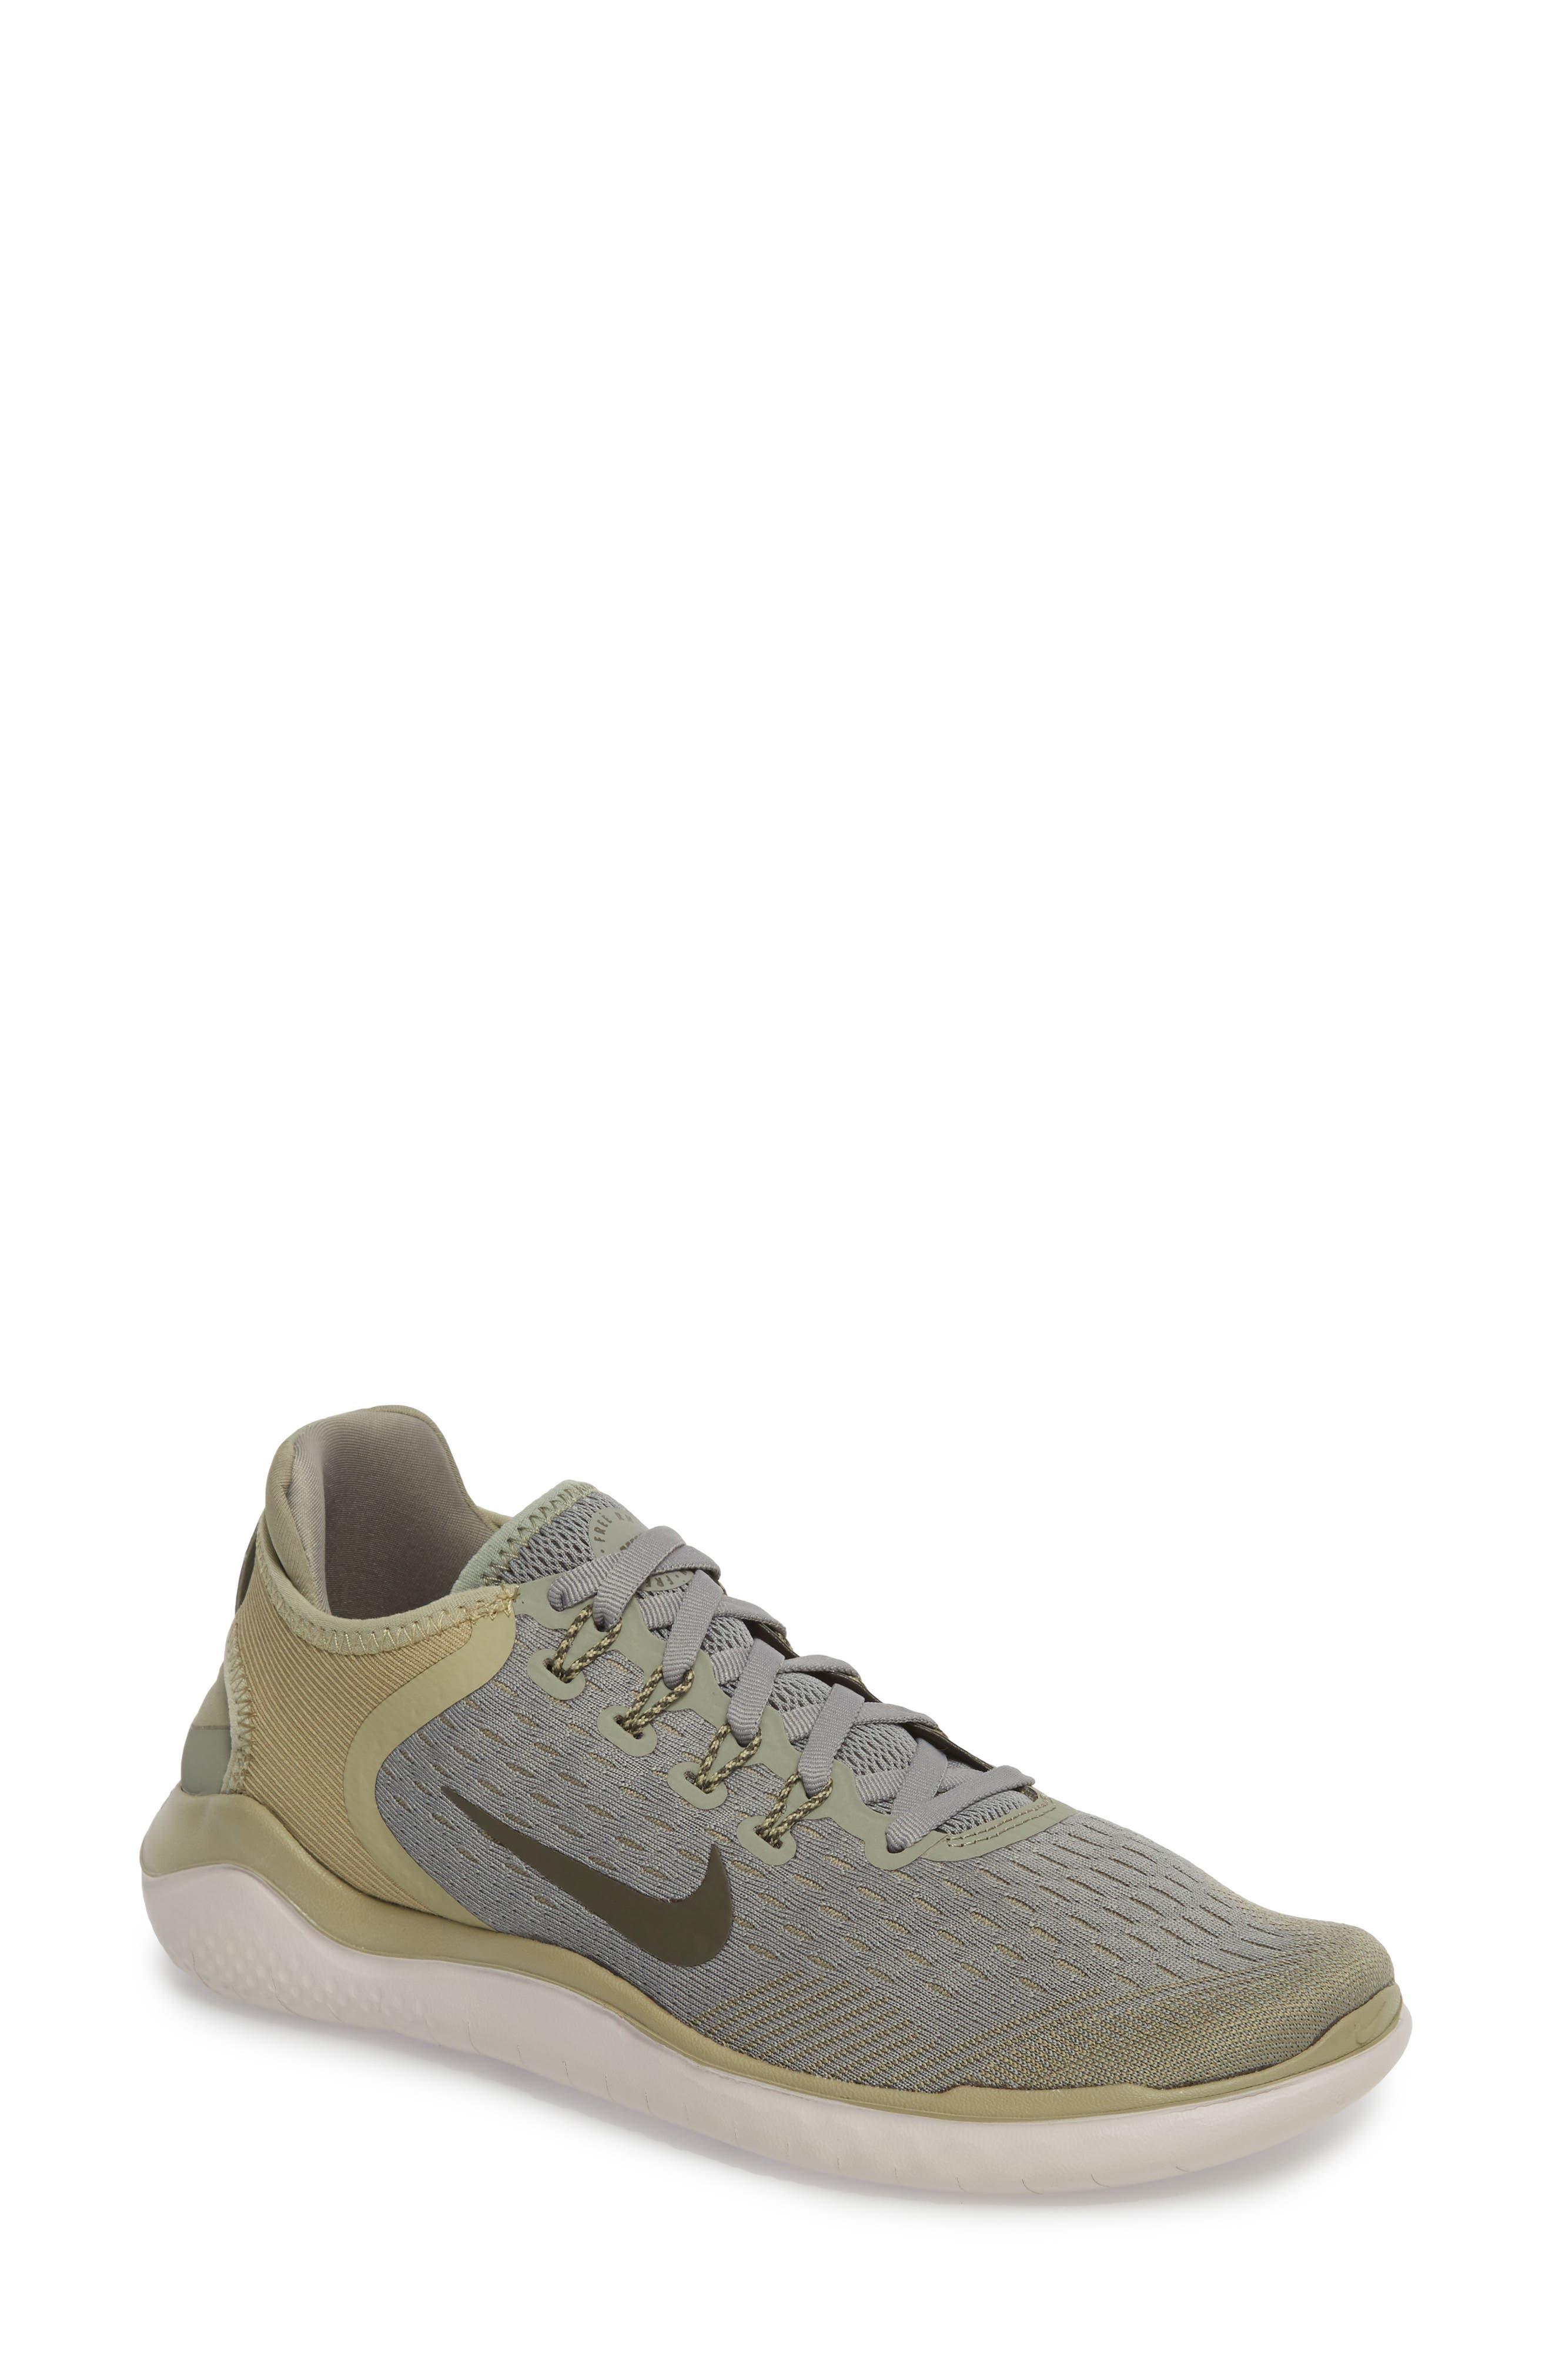 Free RN 2018 Running Shoe,                         Main,                         color, Dark Stucco/ Cargo Khaki